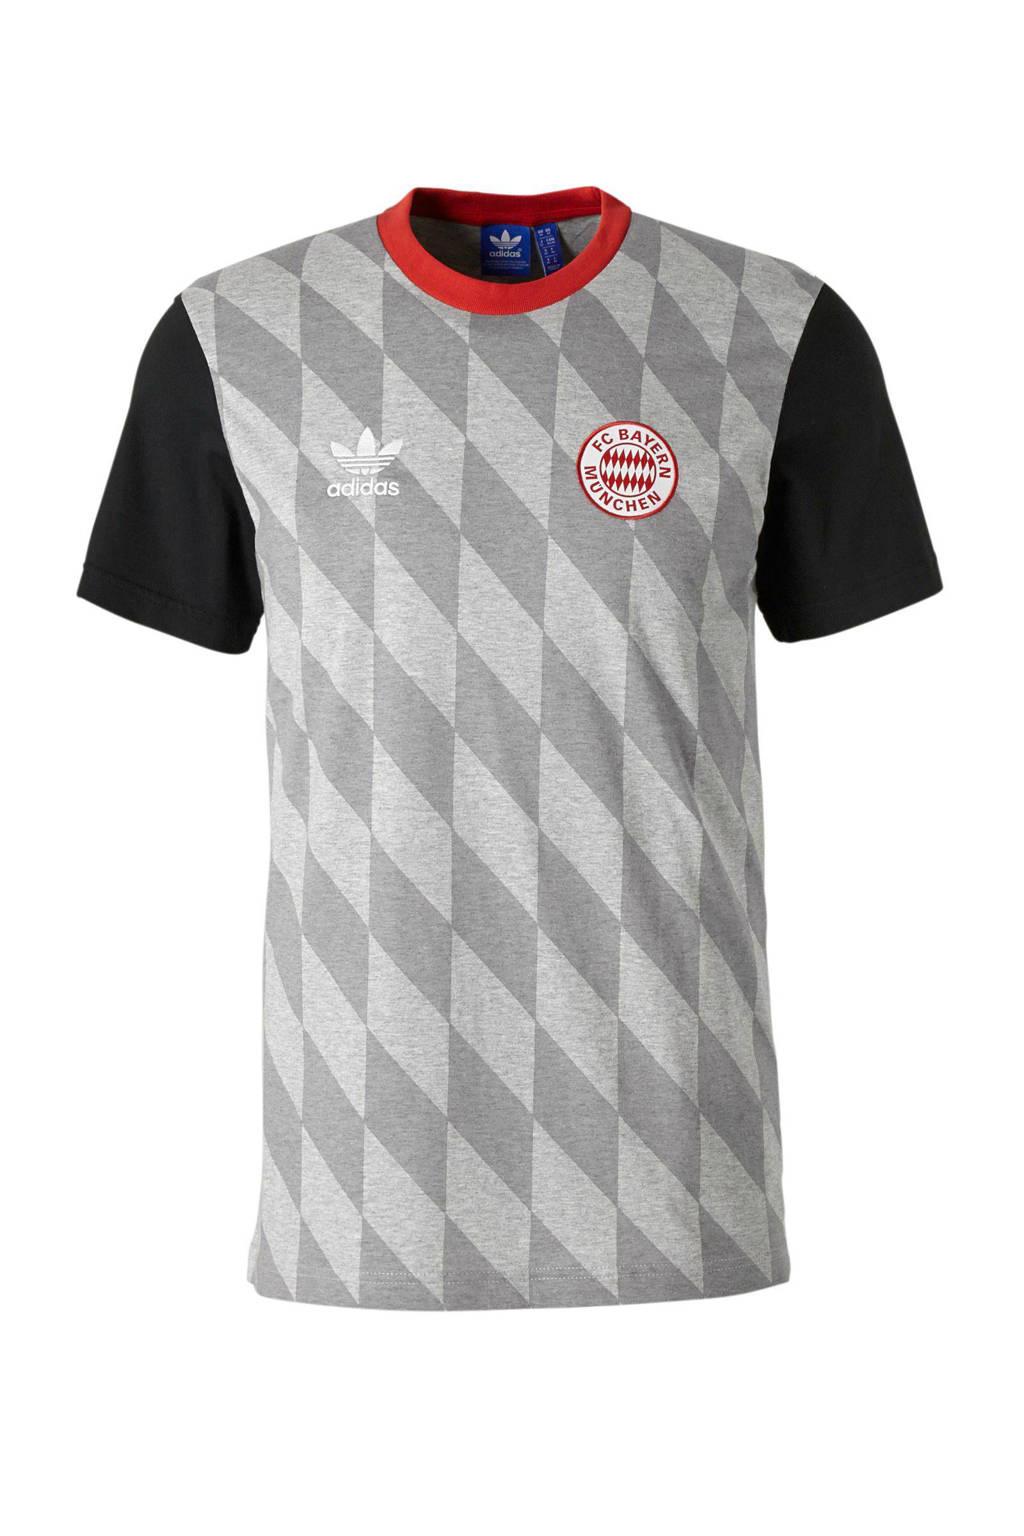 the best attitude 177b2 8e837 Bayern München T-shirt